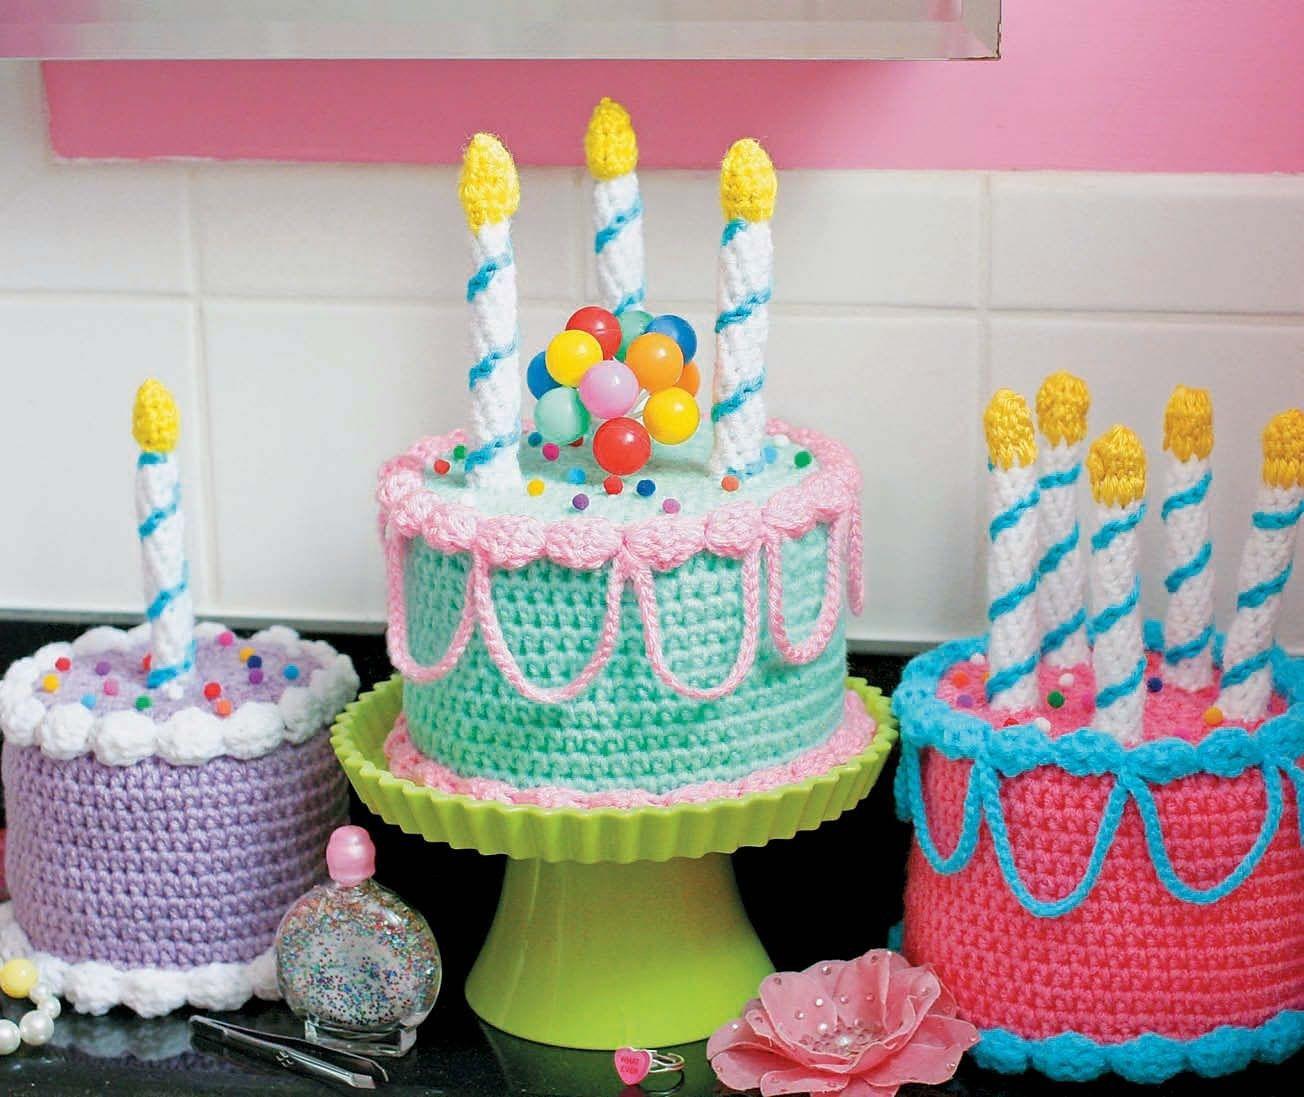 Swell 25 Best Image Of Crochet Birthday Cake Crochet Cake Crochet Birthday Cards Printable Benkemecafe Filternl